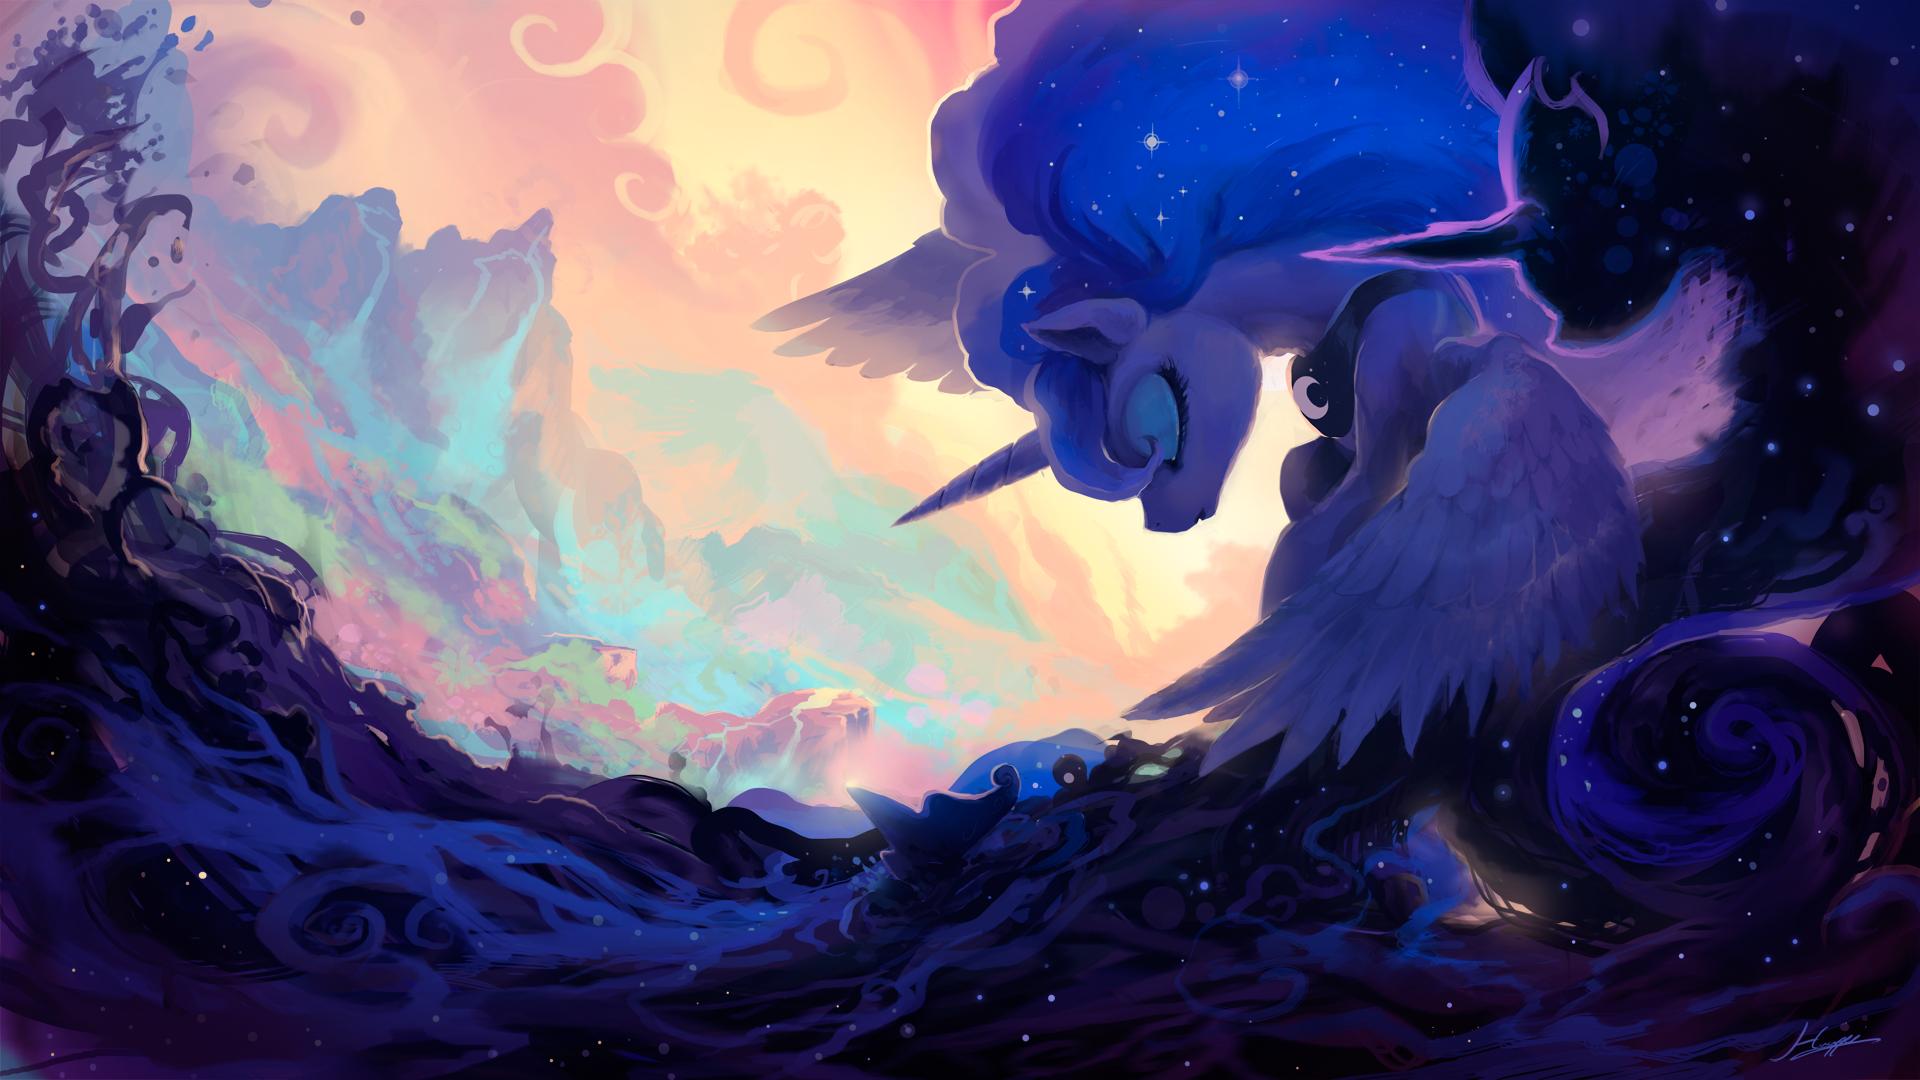 General 1920x1080 My Little Pony Princess Luna